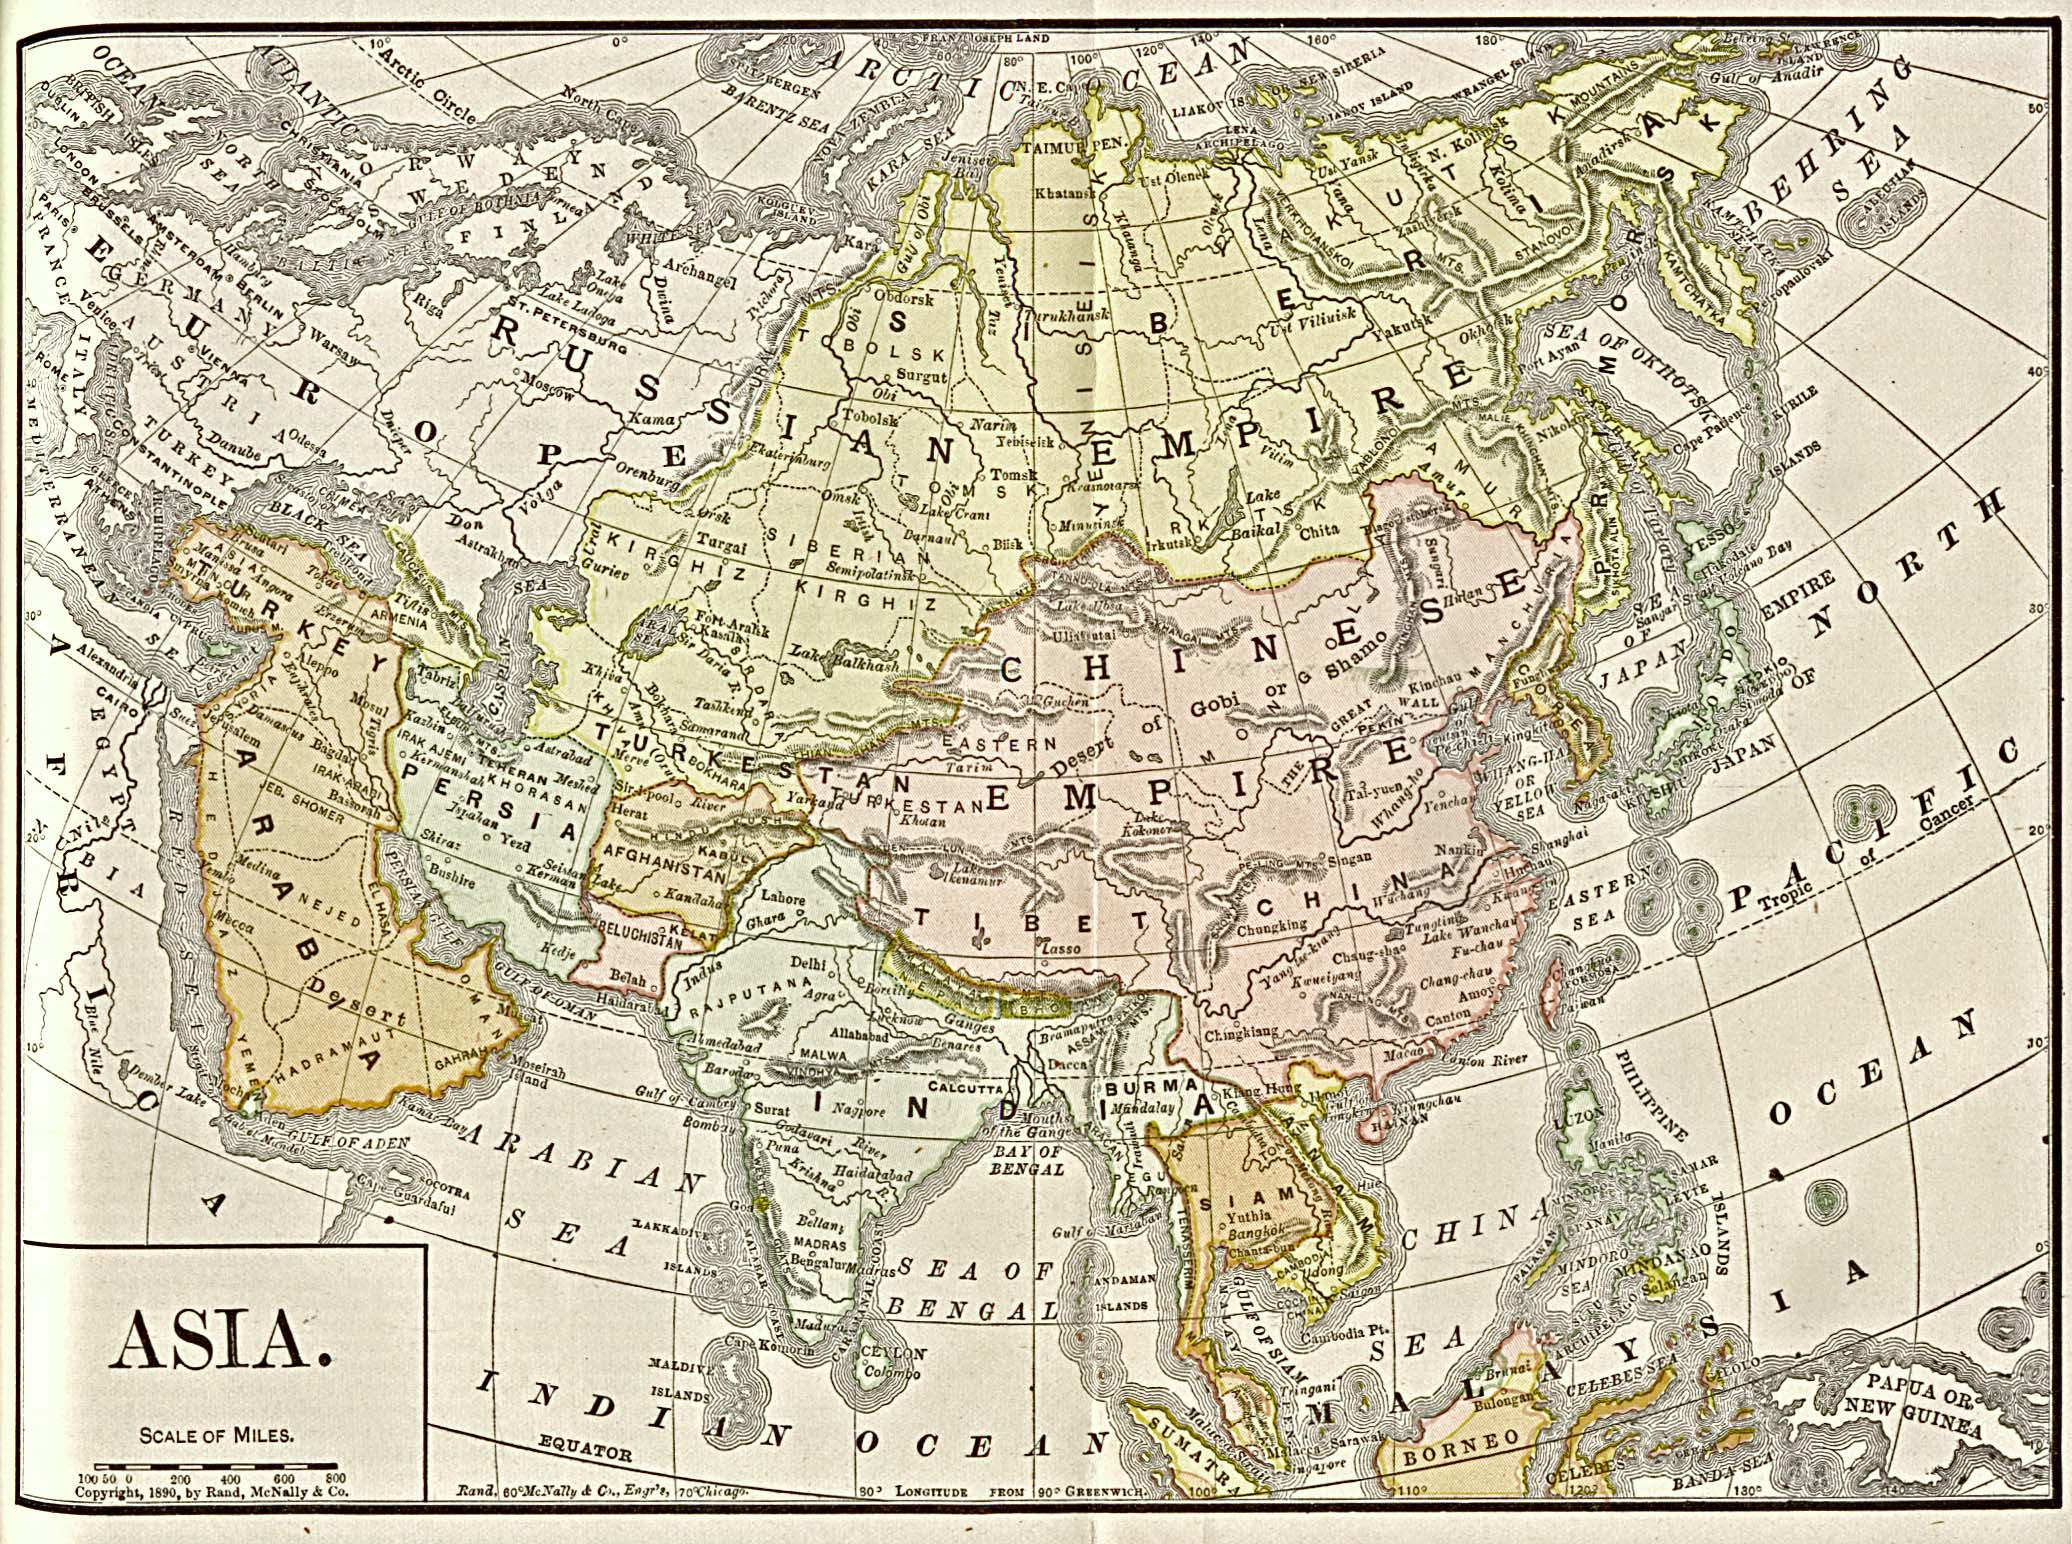 https://i1.wp.com/upload.wikimedia.org/wikipedia/commons/3/3b/Asia_1892_amer_ency_brit.jpg